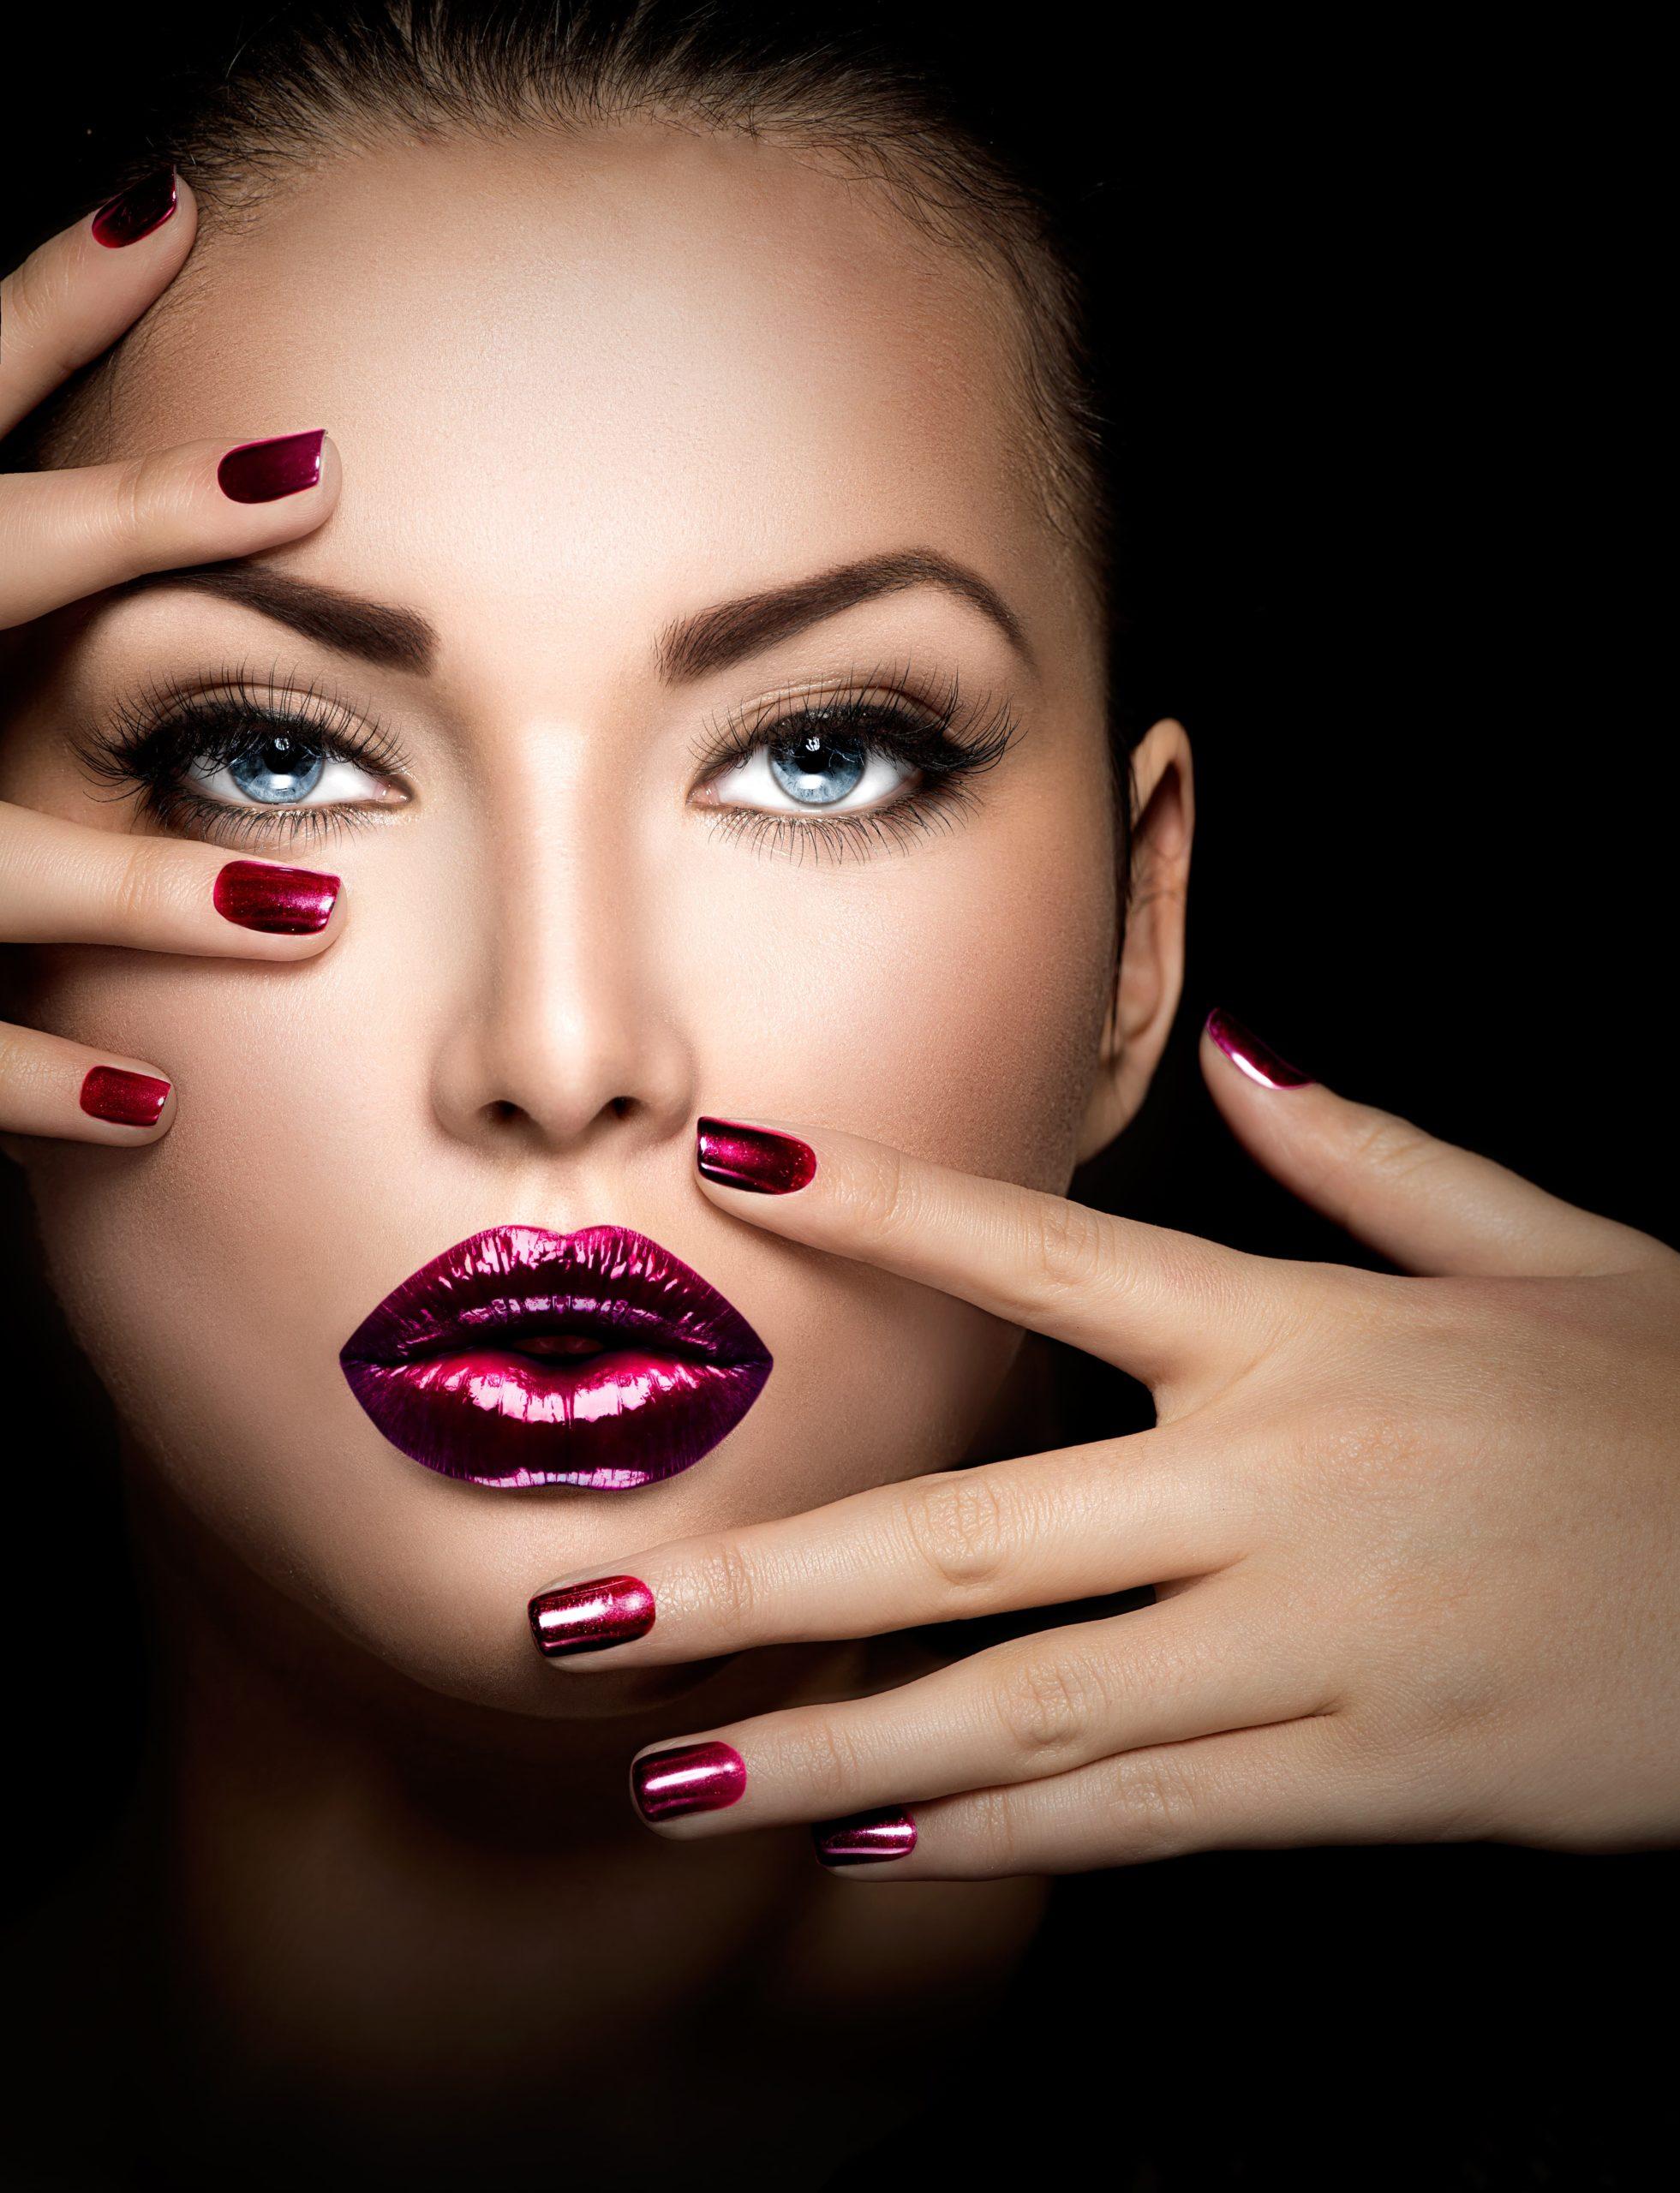 Kosmetik & Gesichtsbehandlung Nata-Studio